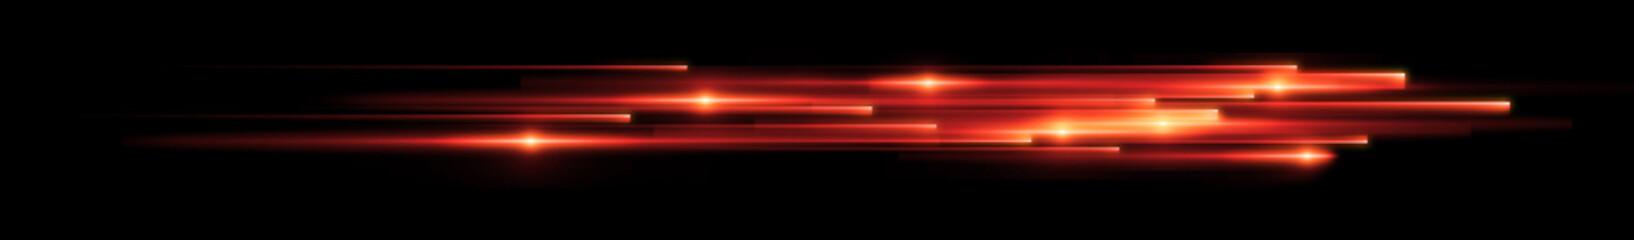 Dynamic lights shape on dark background. High speed optical fiber concept. 3d rendering Fototapete